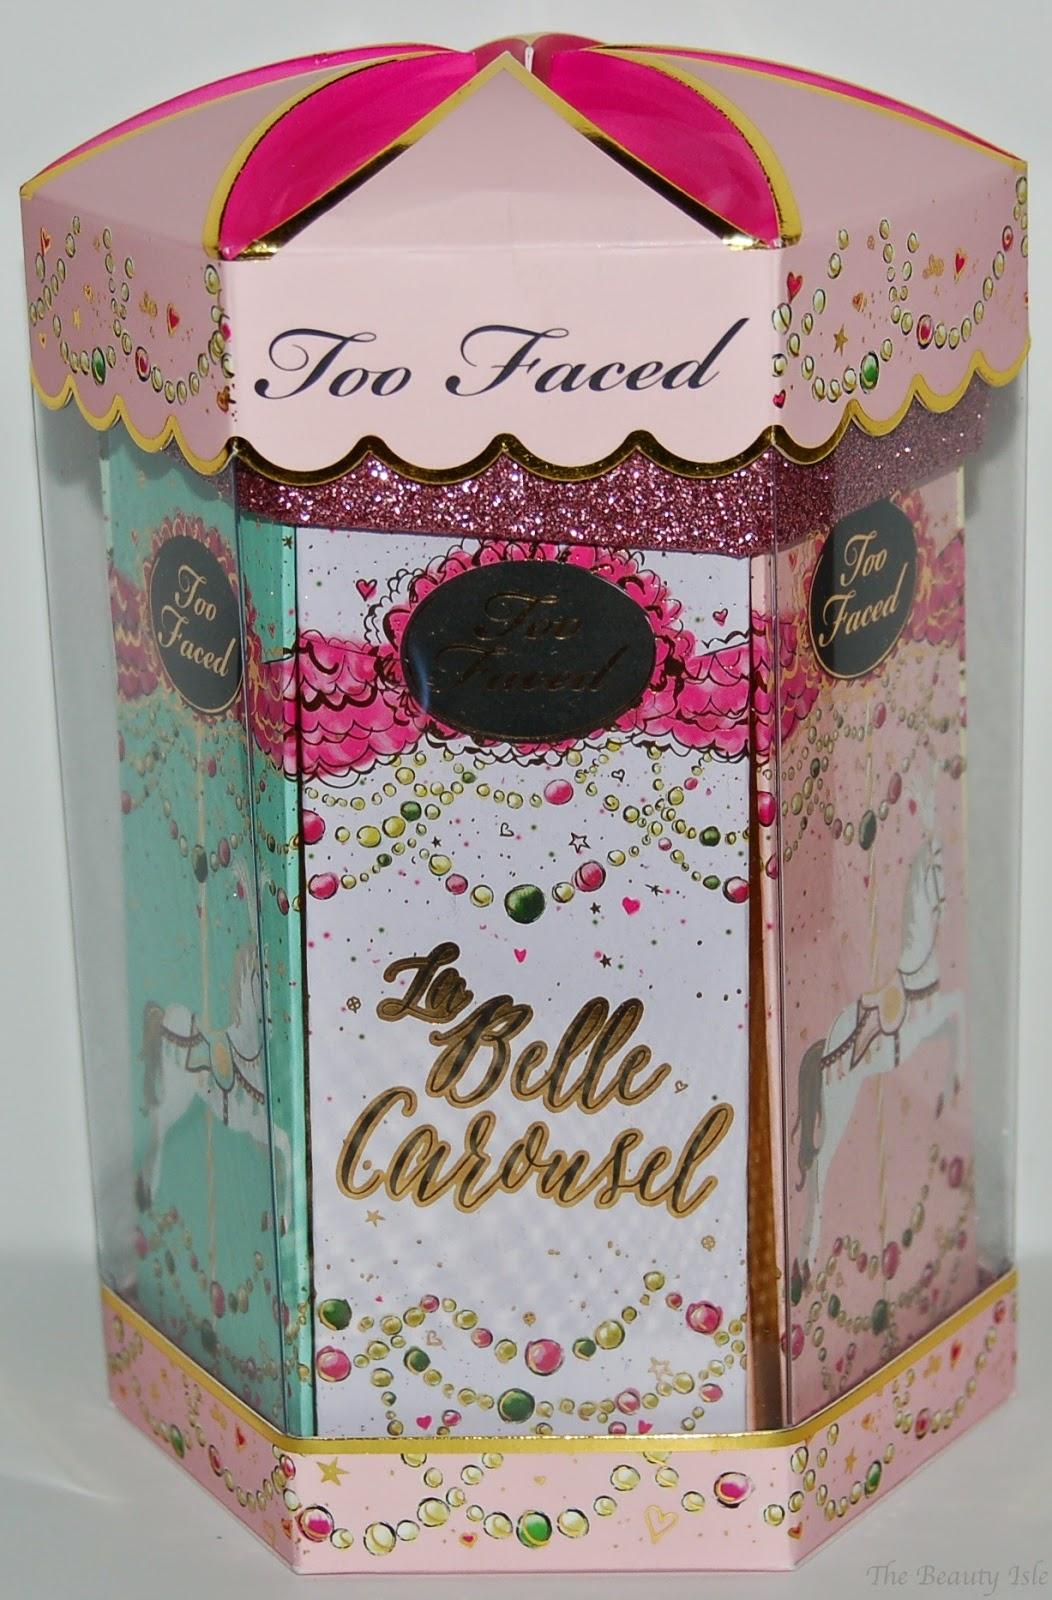 Too Faced La Belle Carousel